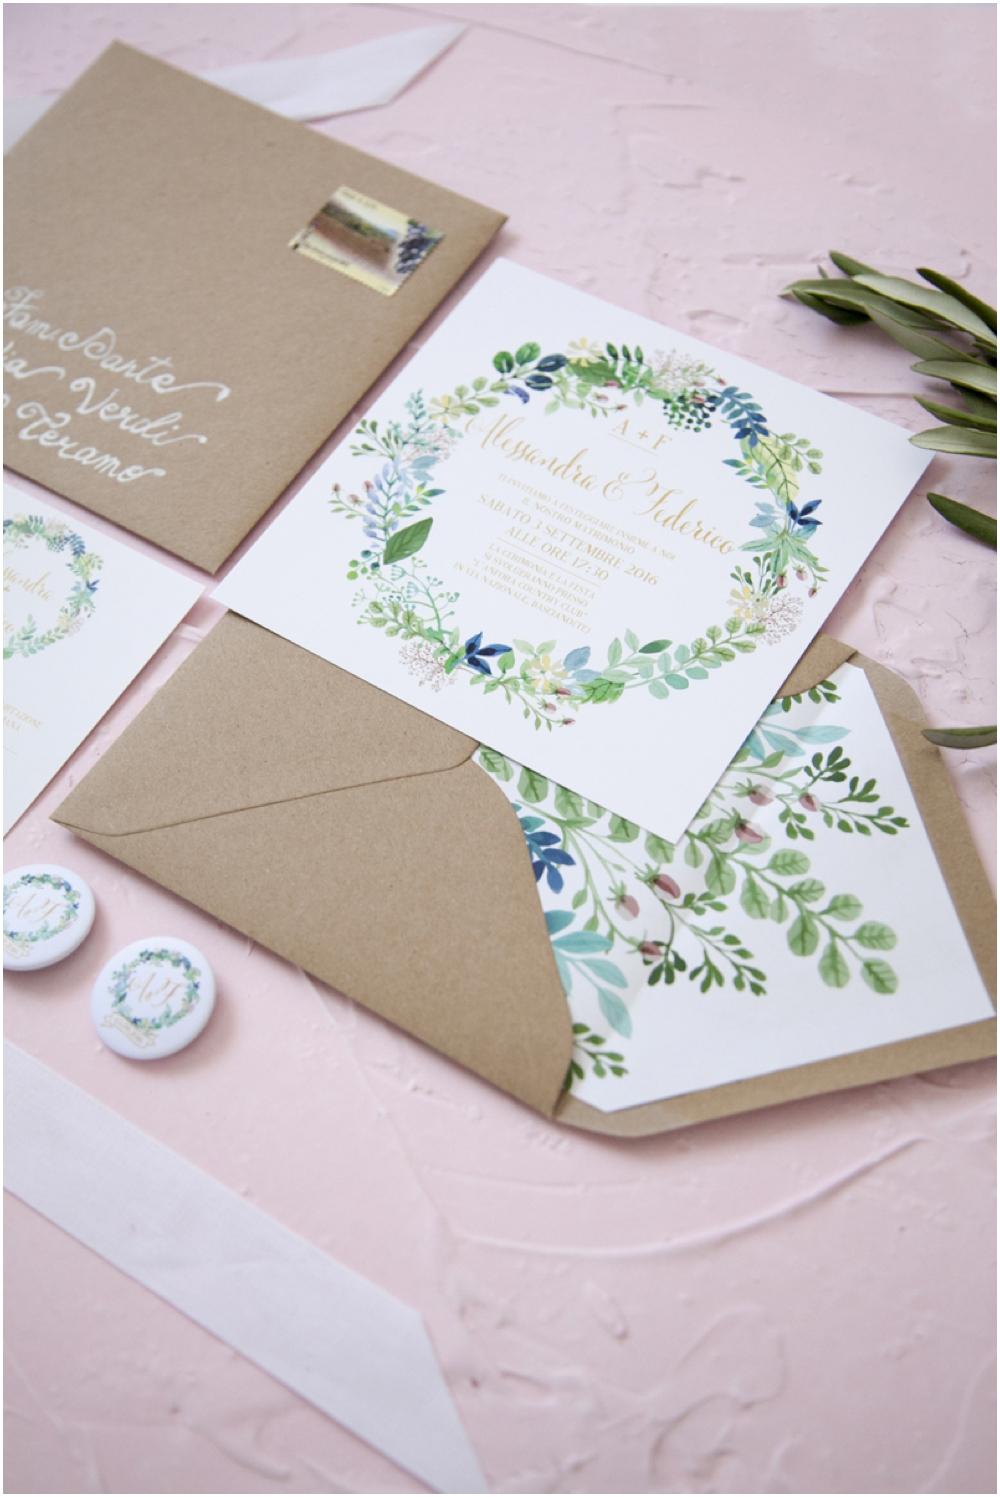 aucadesign_weddingstationery_rosa_floreale_0002